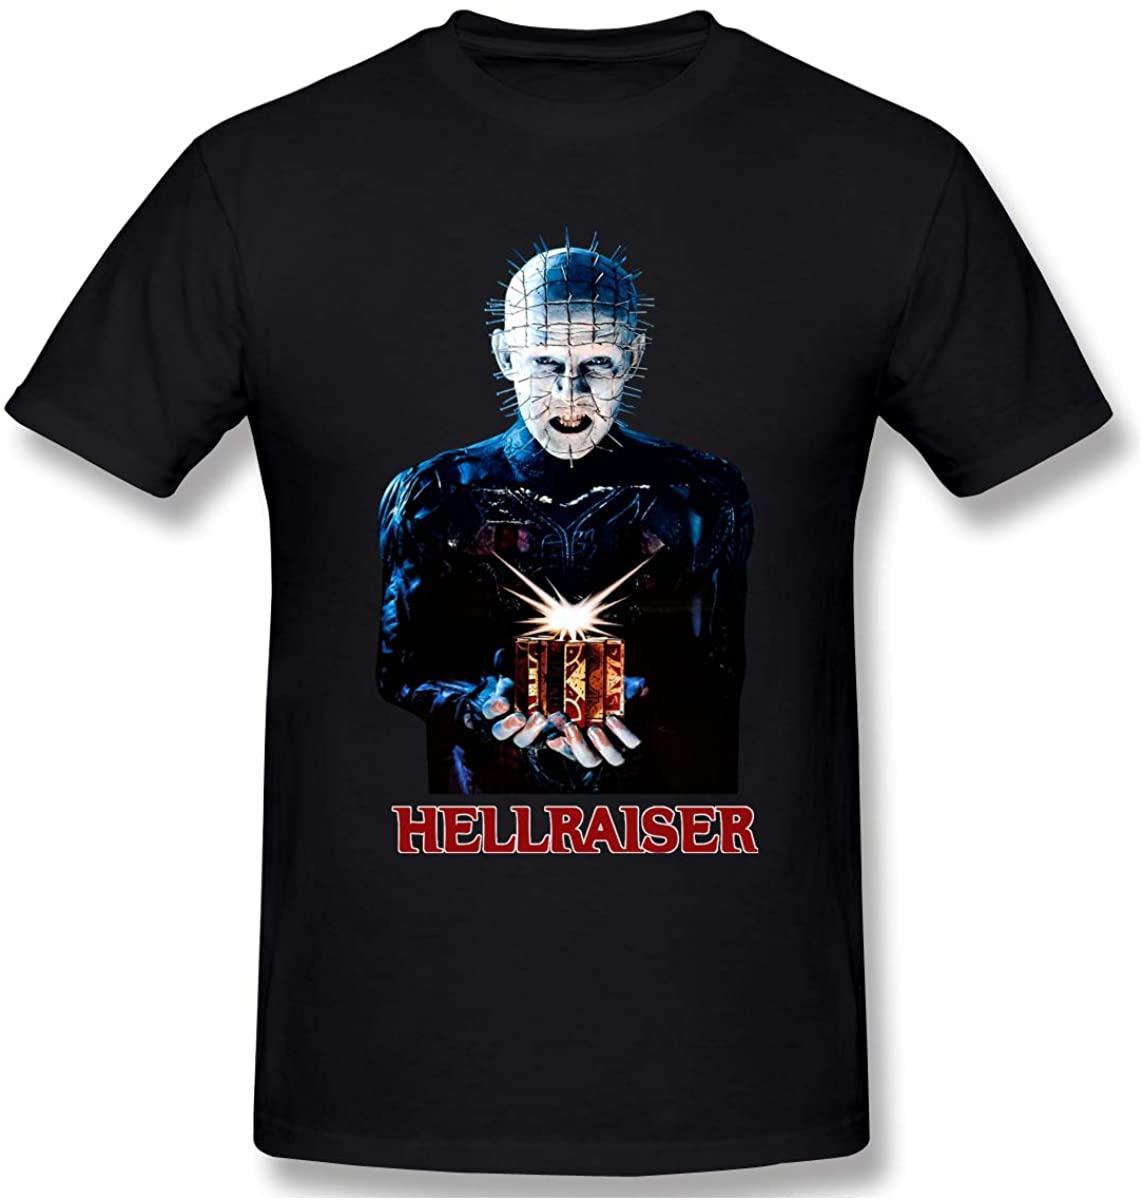 BARKBAY Men's Hellraiser Graphic Short Sleeve Round Neck T Shirts